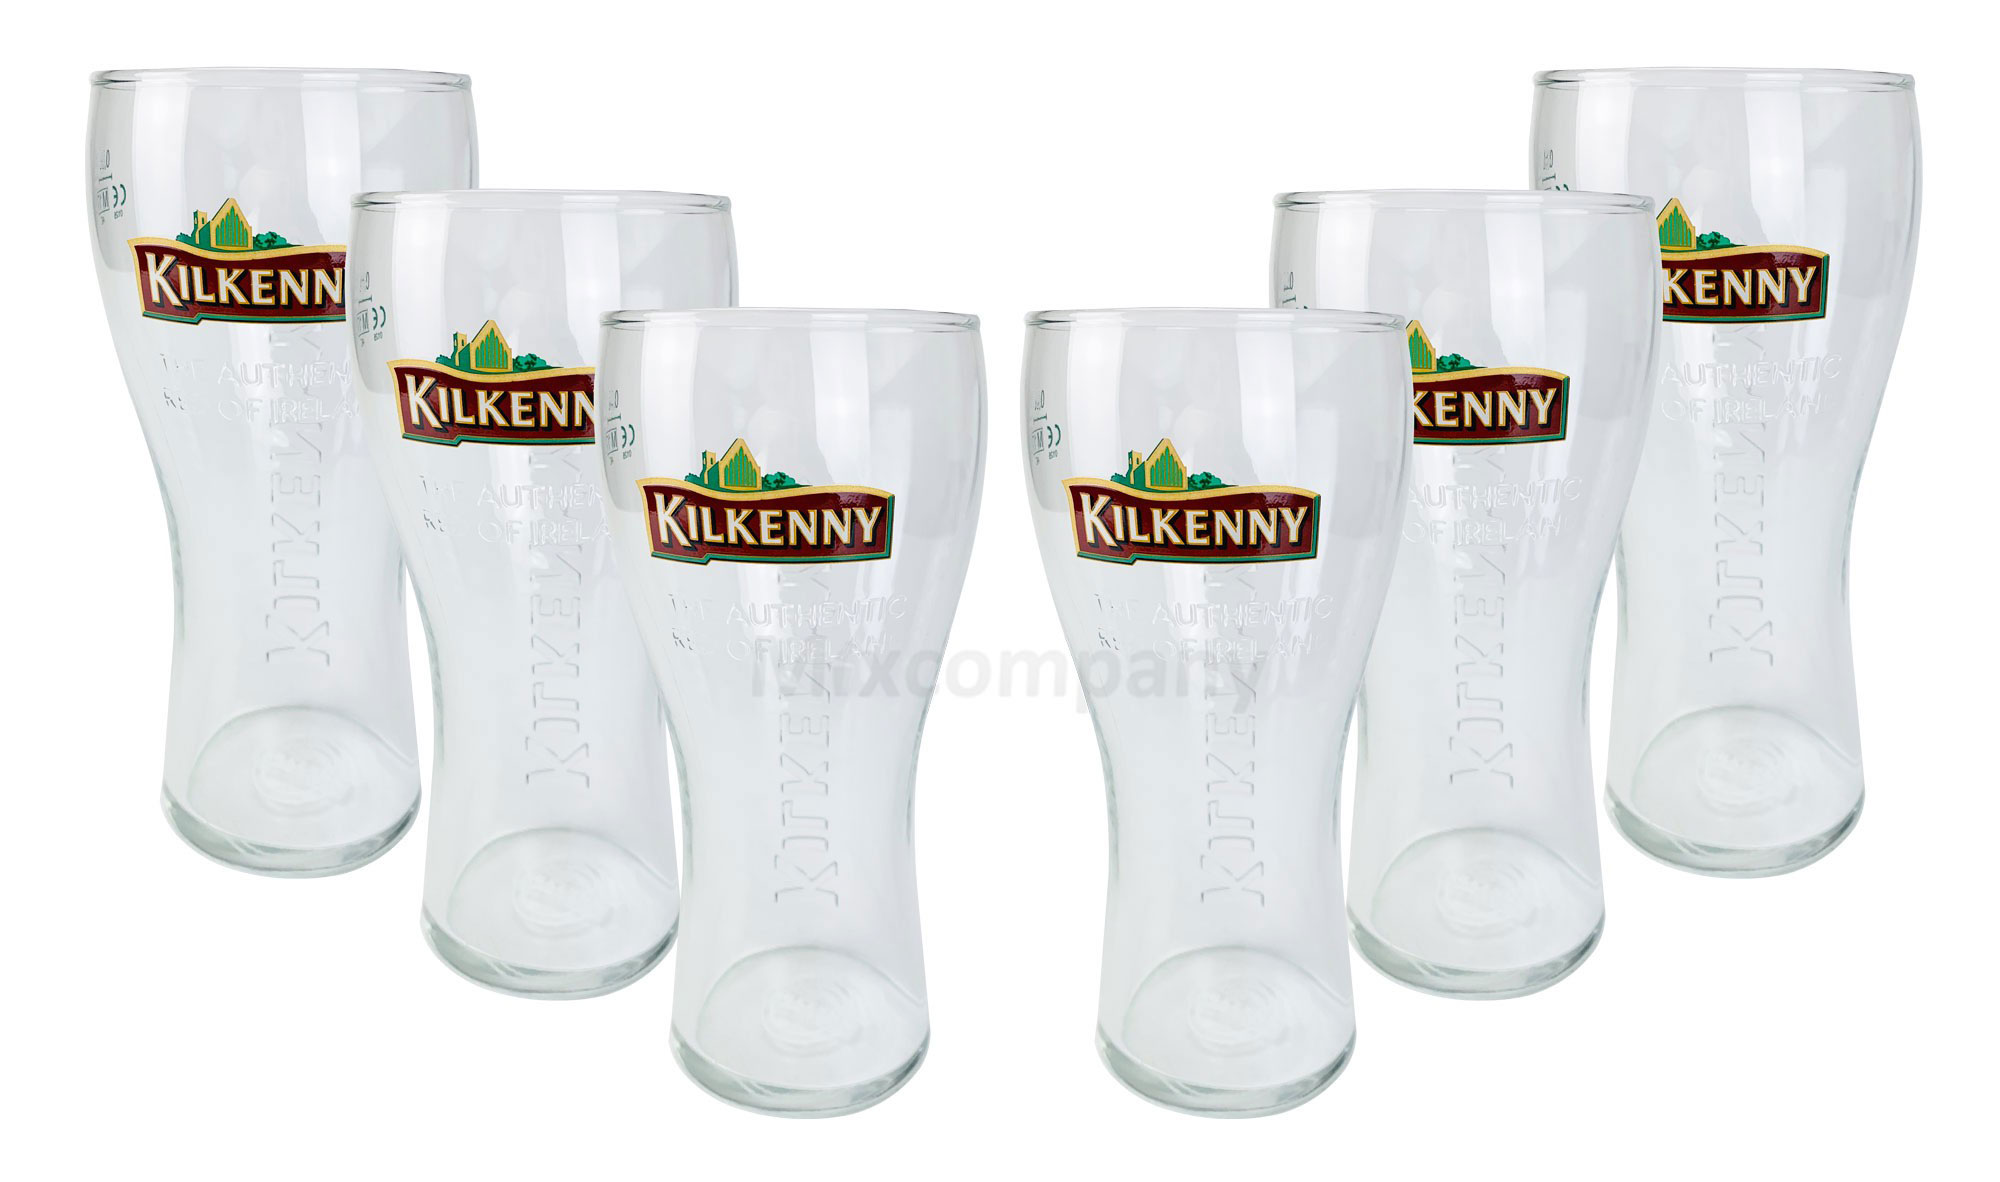 Kilkenny Bier Bierglas Glas Gläser Set - 6x Biergläser 0,2l geeicht